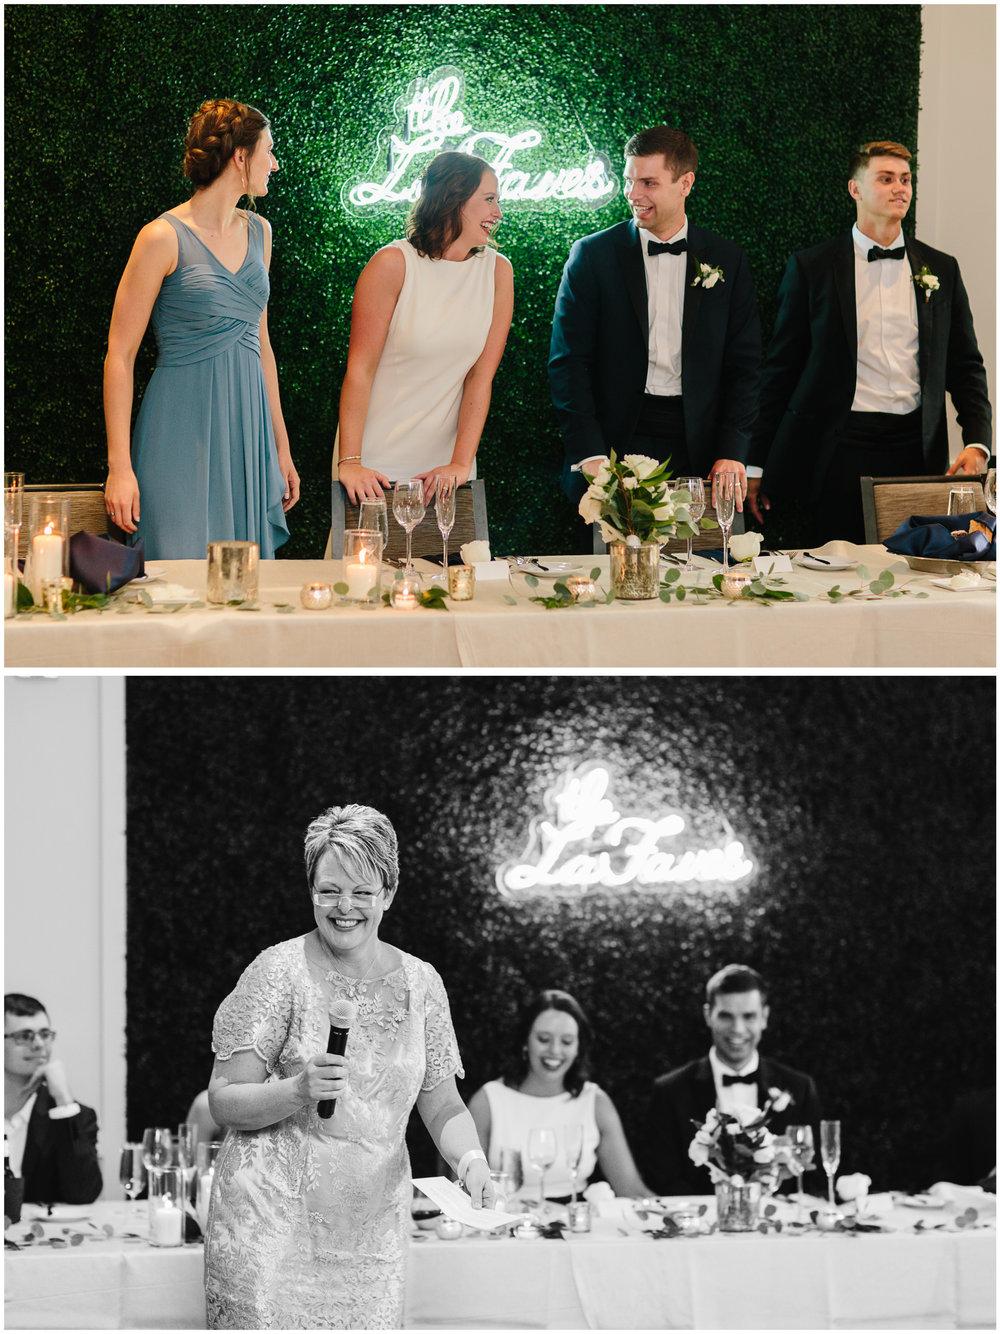 JW_Marriott_Wedding_55.jpg